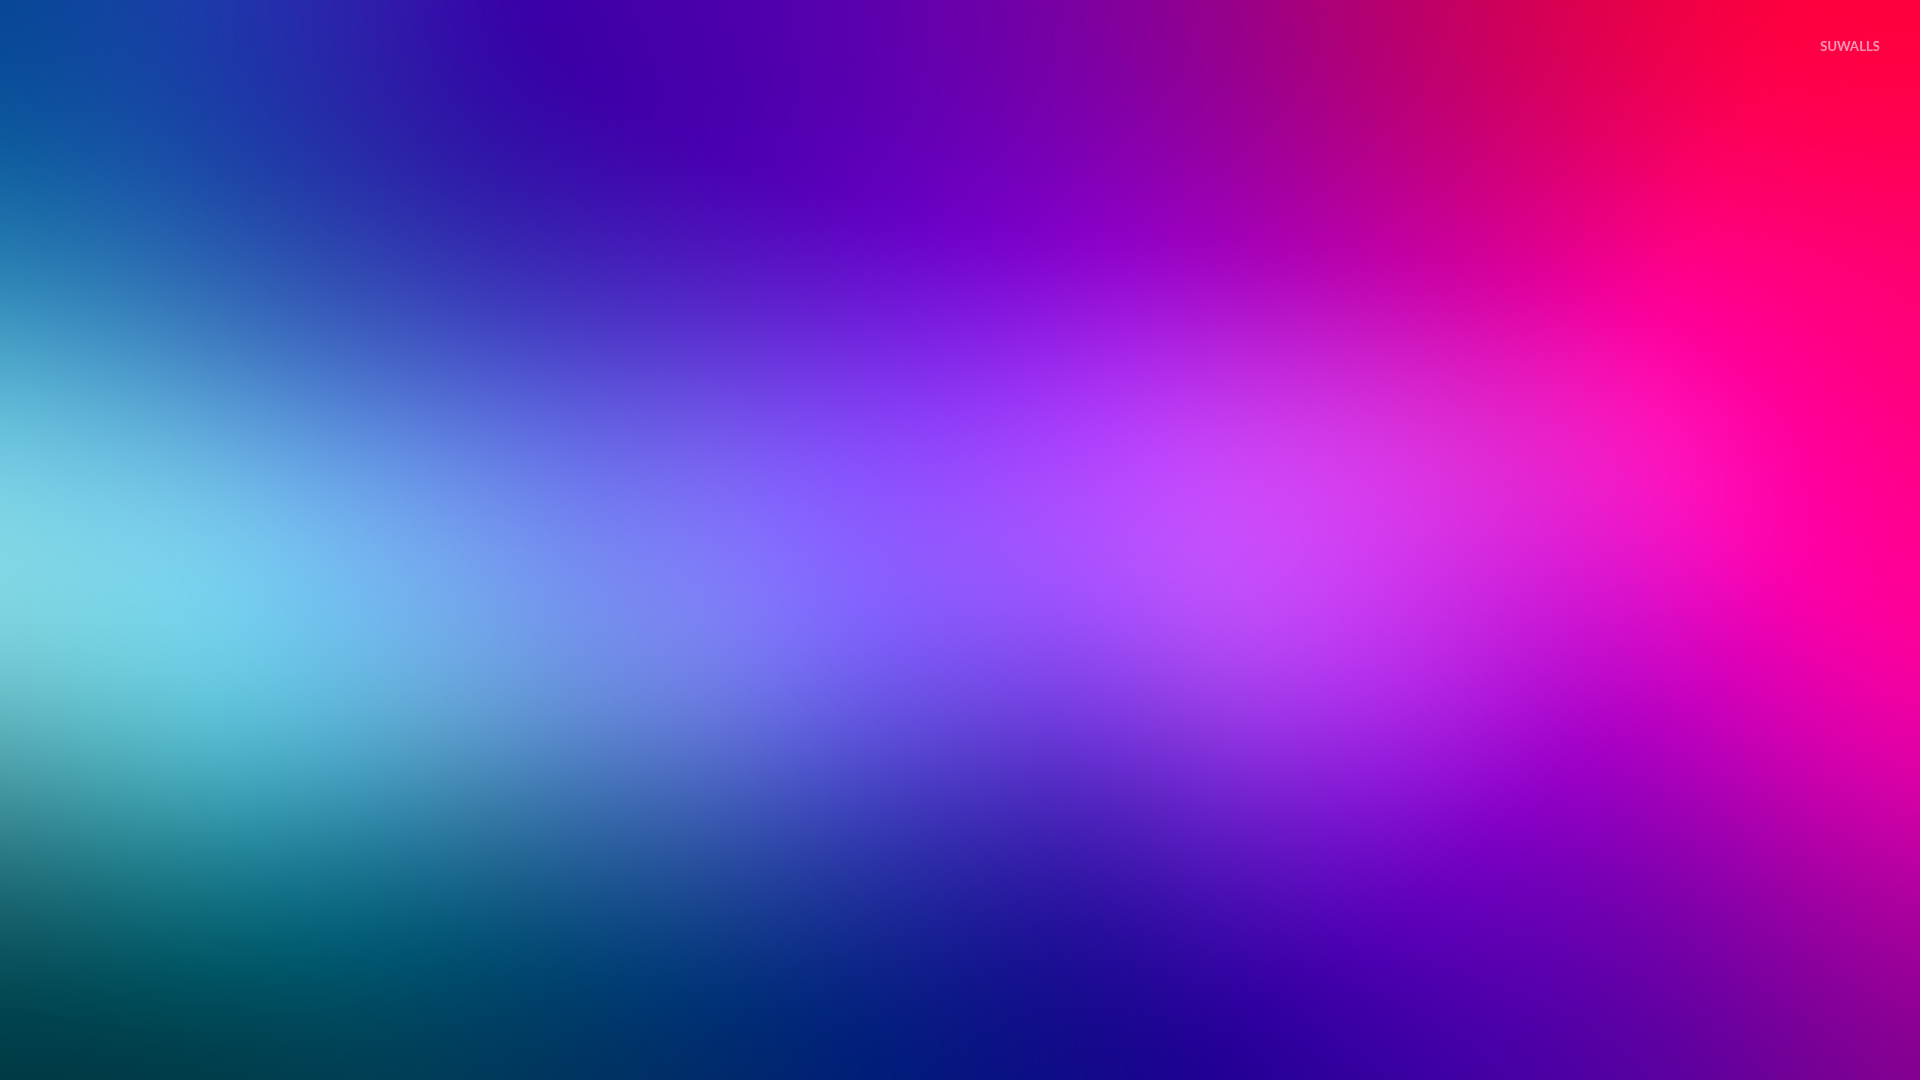 blur wallpapers desktop wallpaper - photo #24